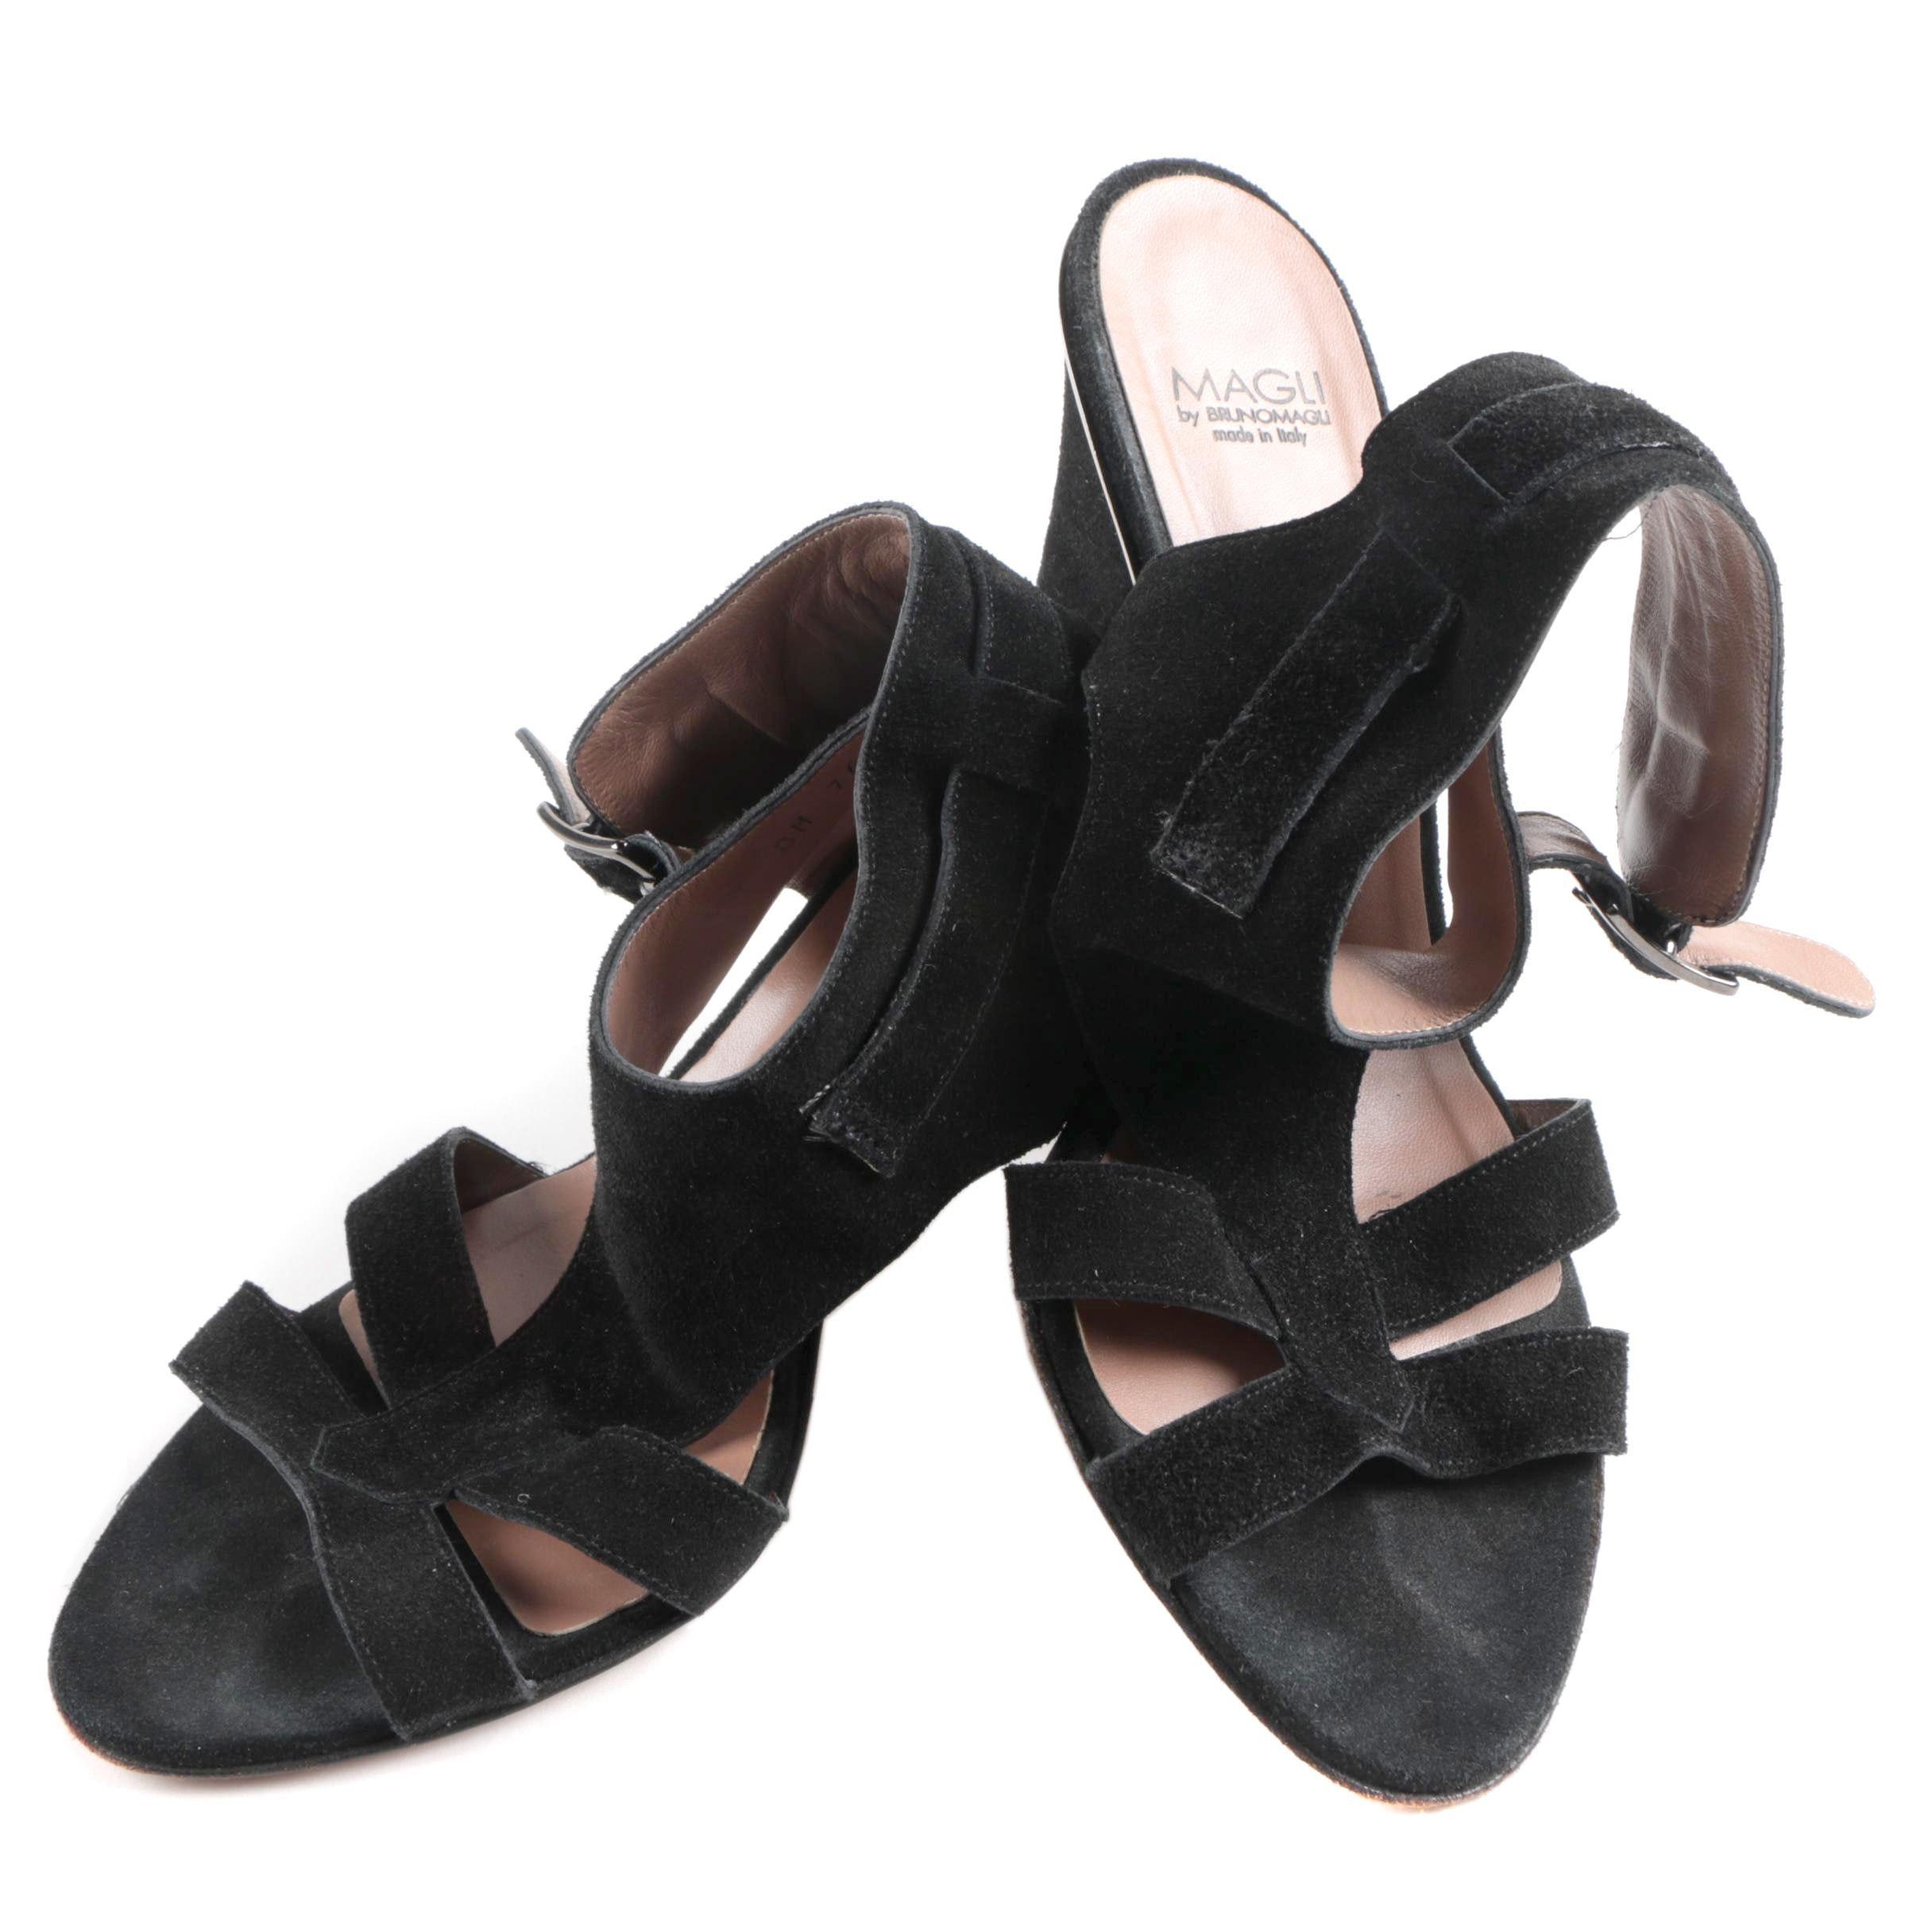 Magli by Bruno Magli Black Suede Heels